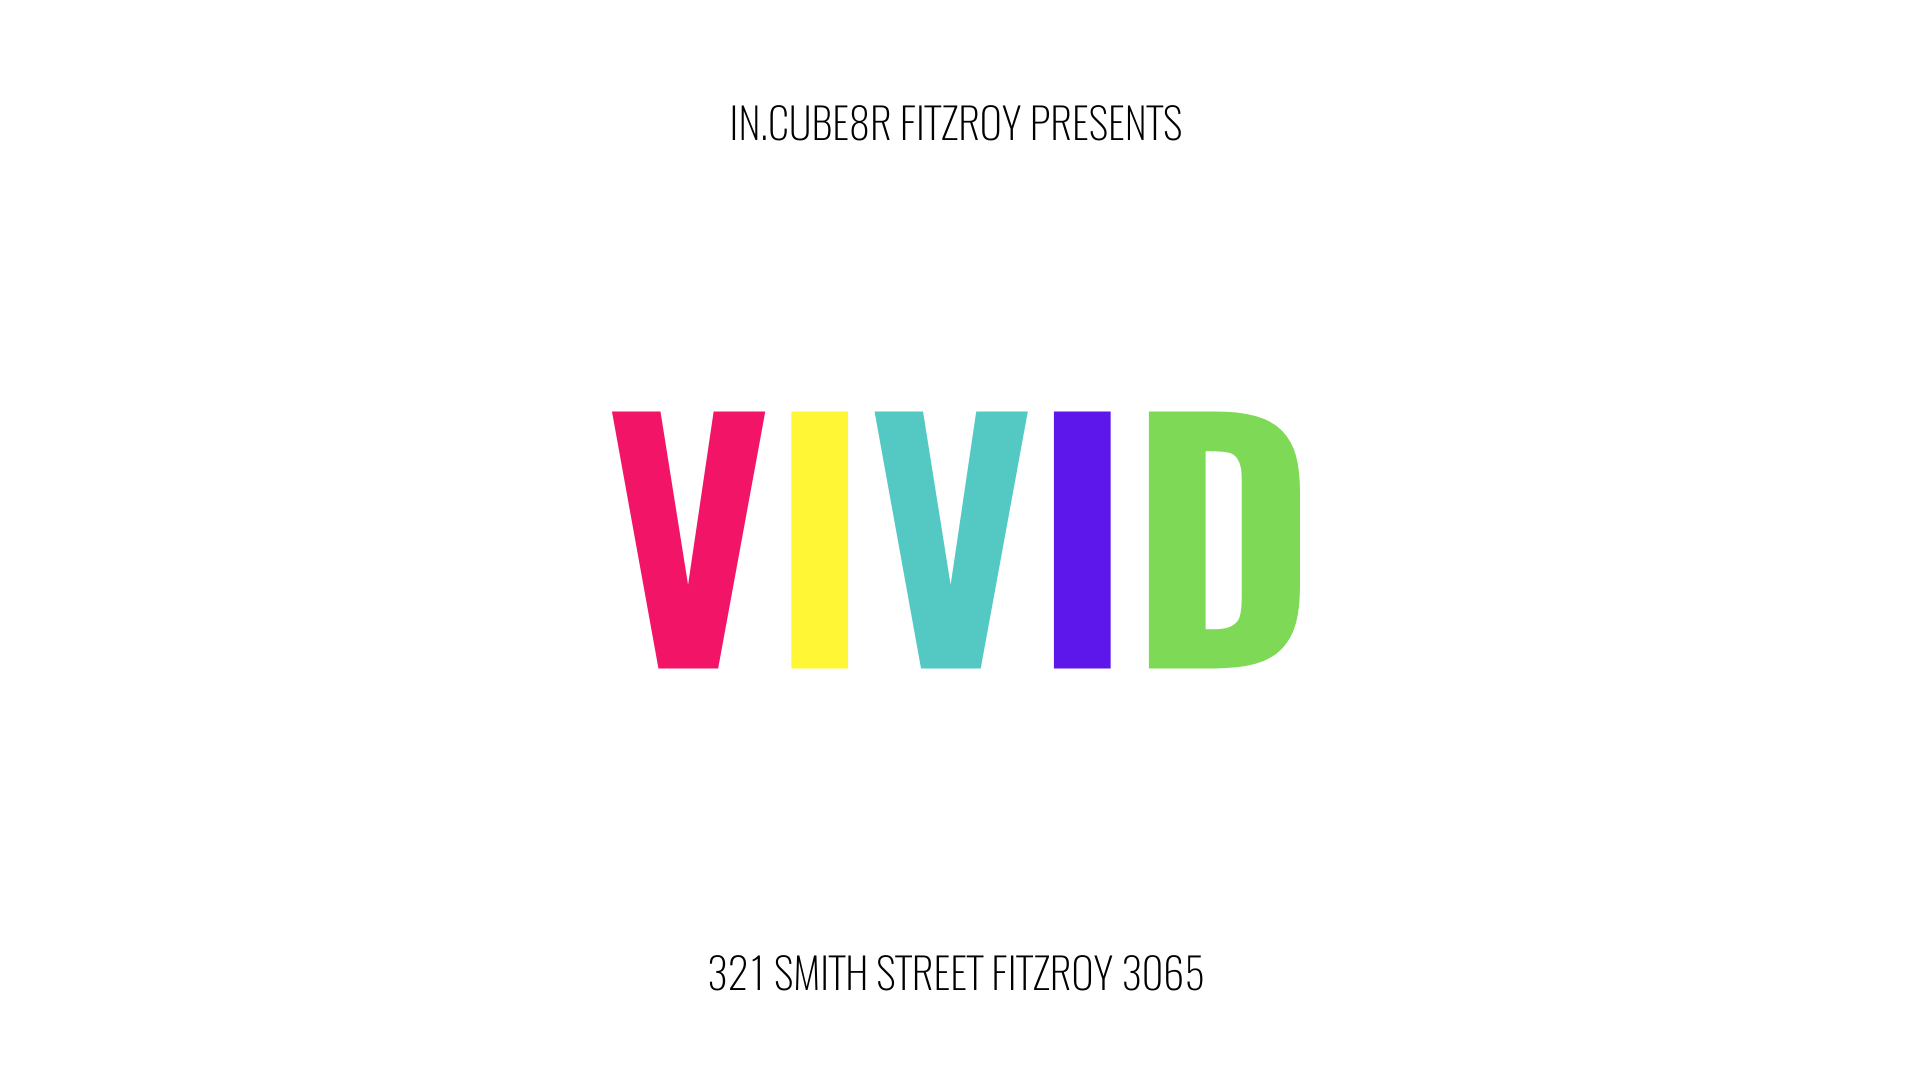 vivid-group-exhibition ellemay.michael 453210